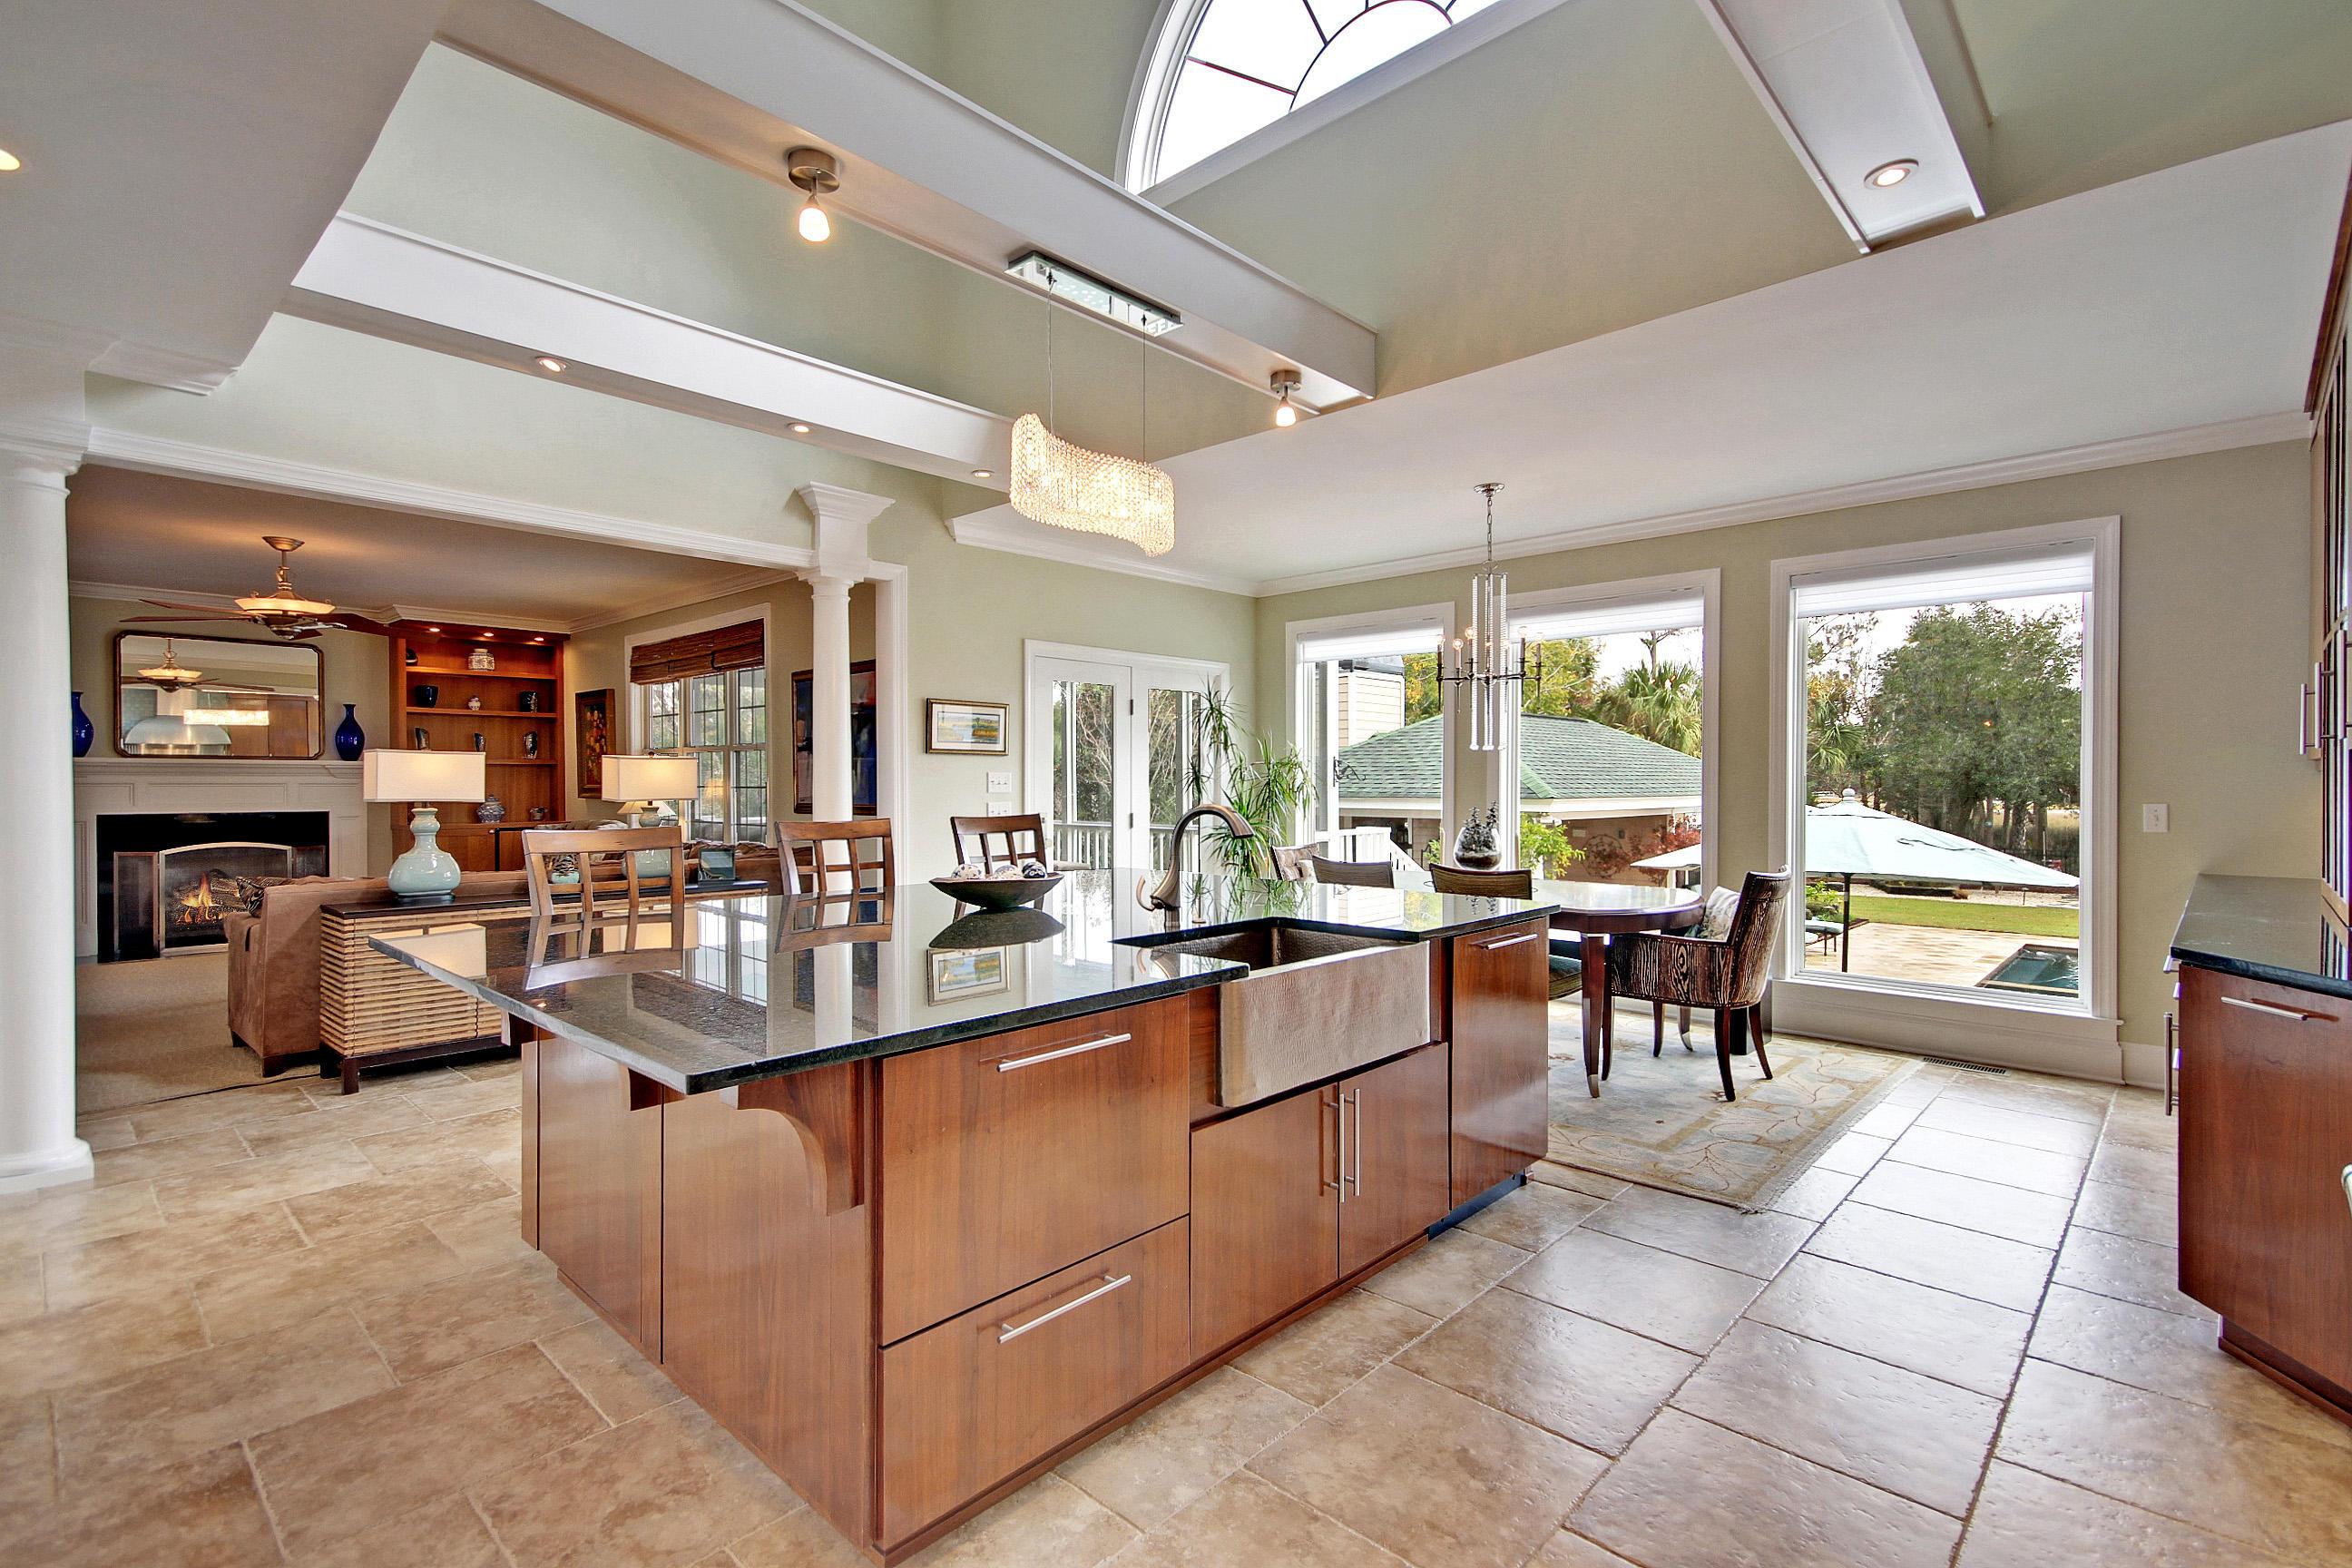 Dunes West Homes For Sale - 2364 Darts Cove, Mount Pleasant, SC - 51